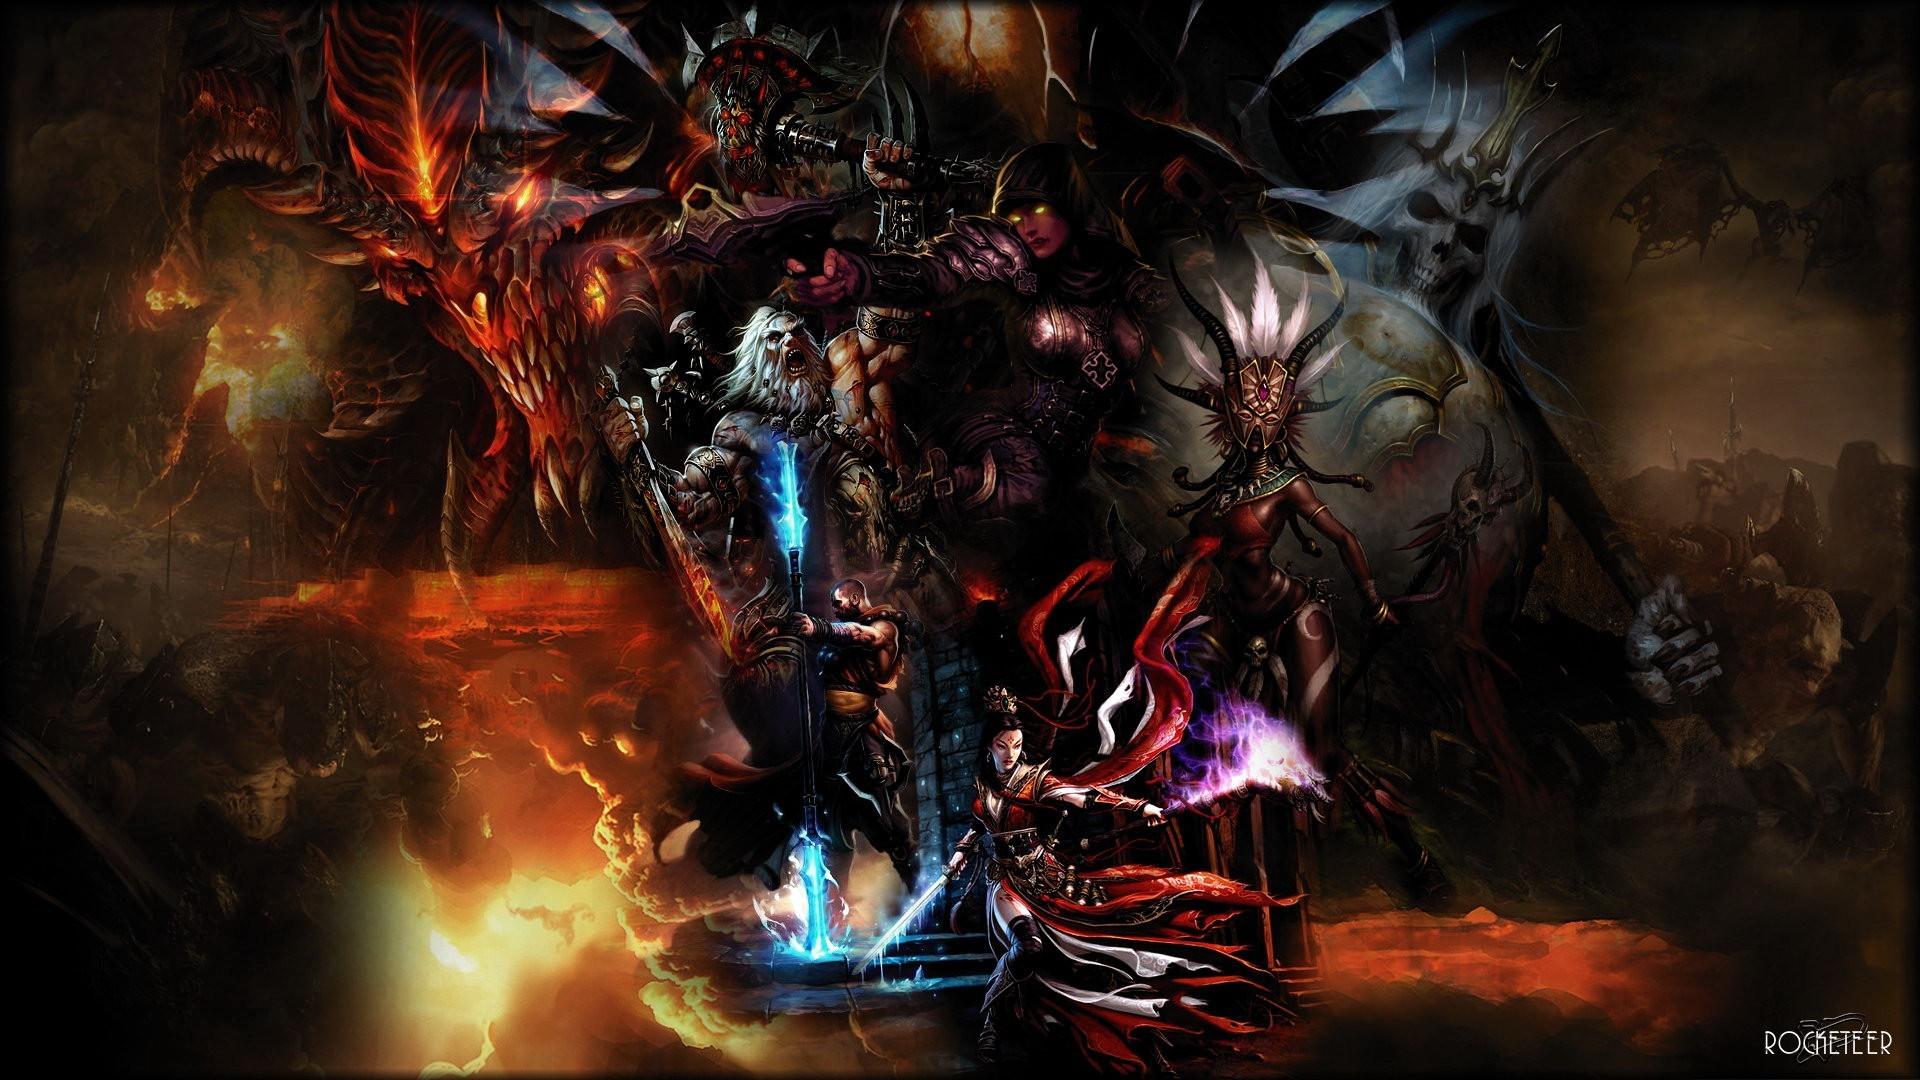 114 Demon Hunter (Diablo III) HD Wallpapers | Backgrounds – Wallpaper Abyss  – Page 3